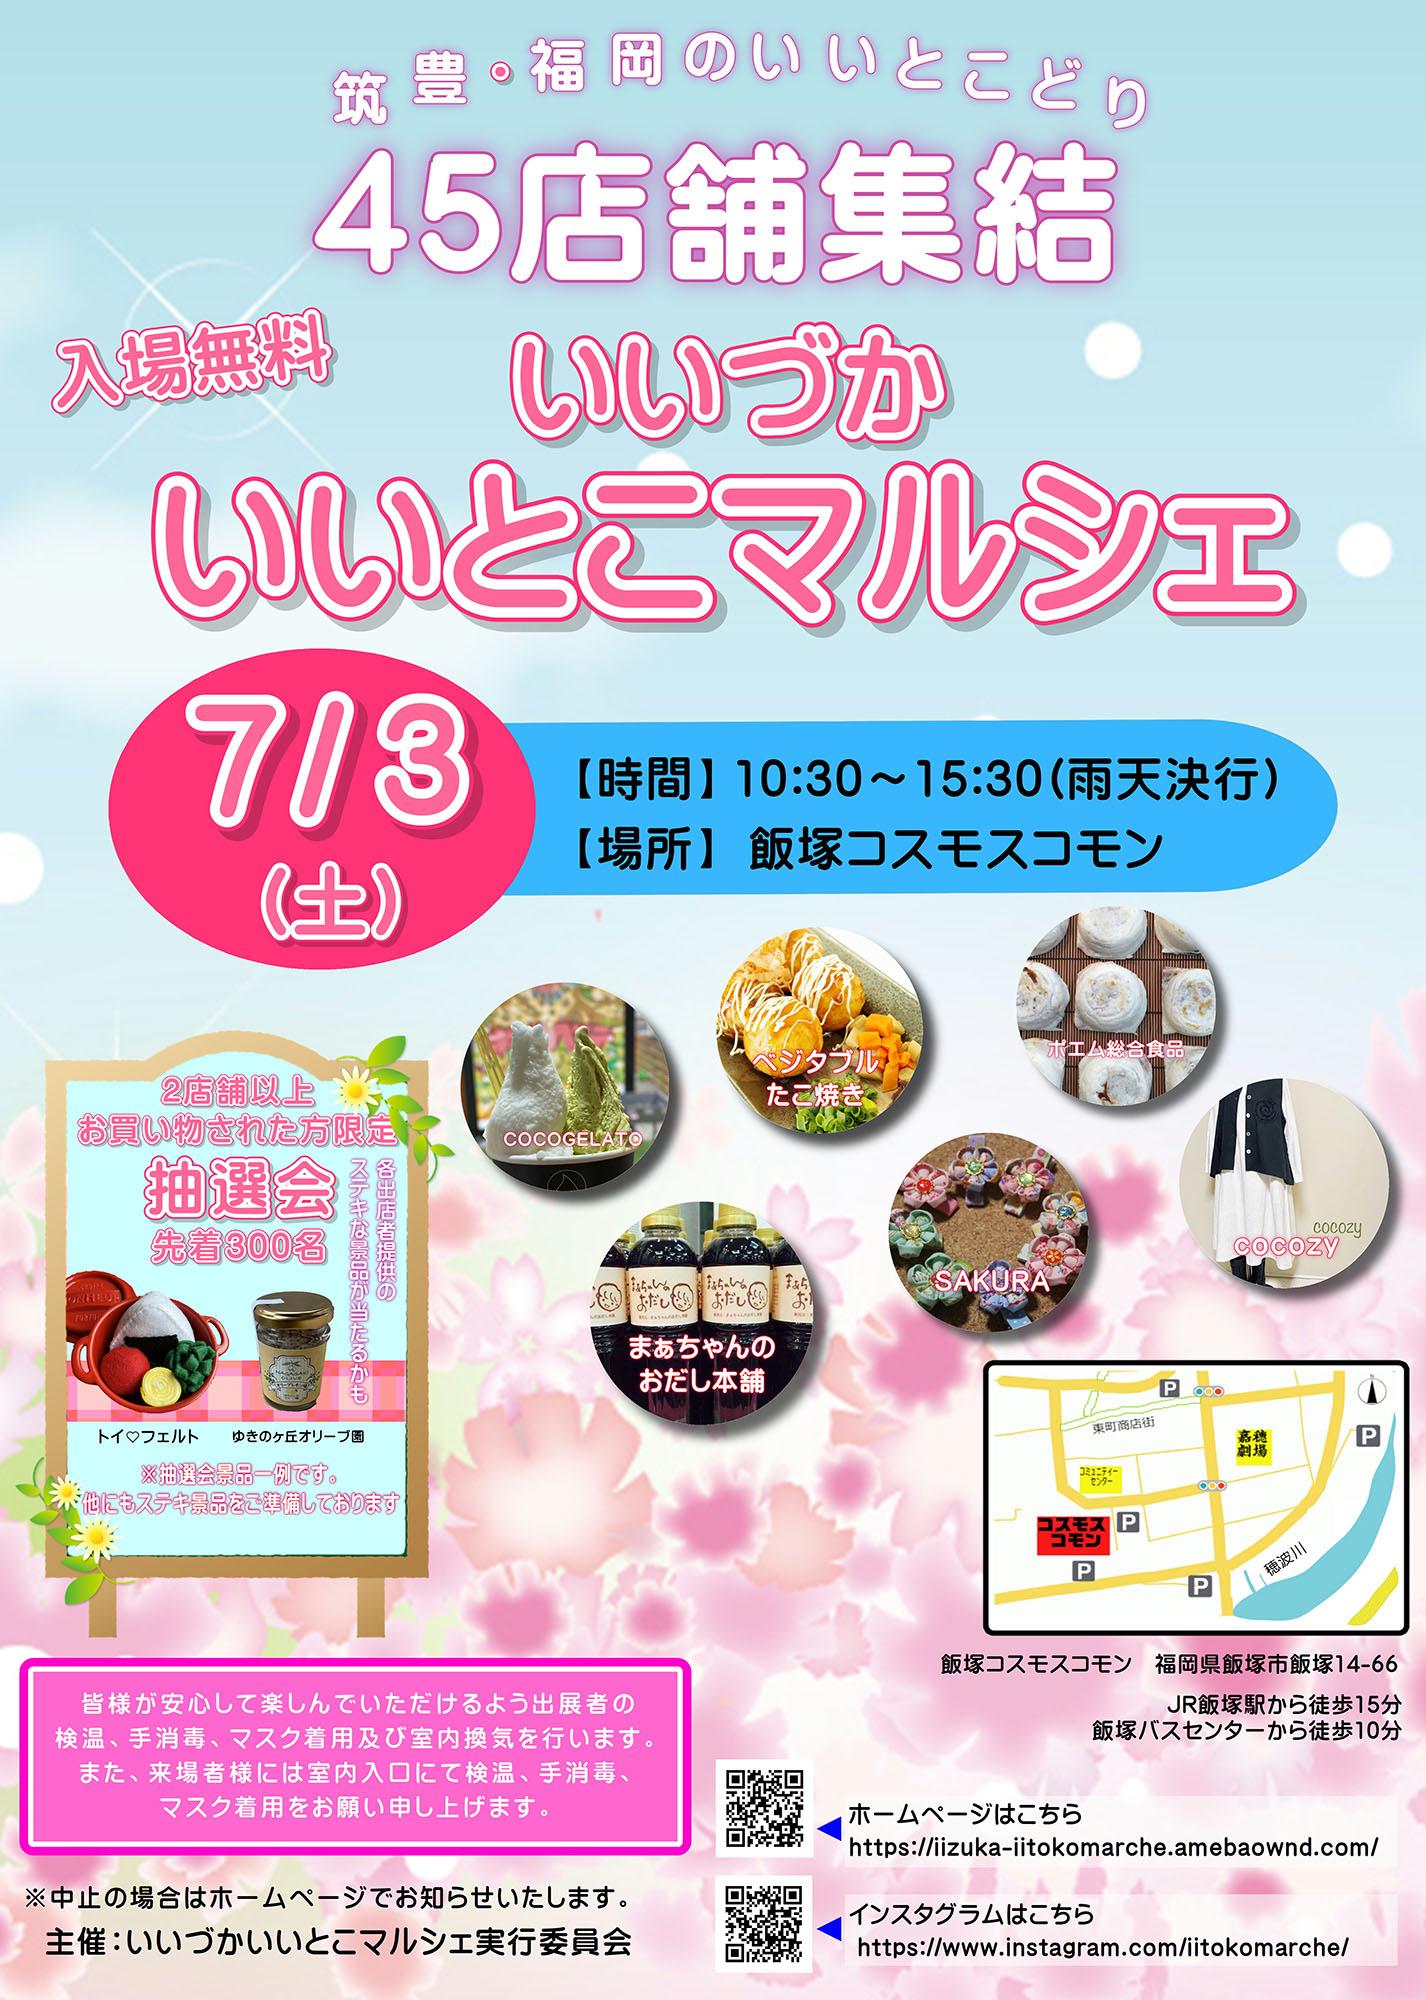 20210703_iizuka_iitoko_marche